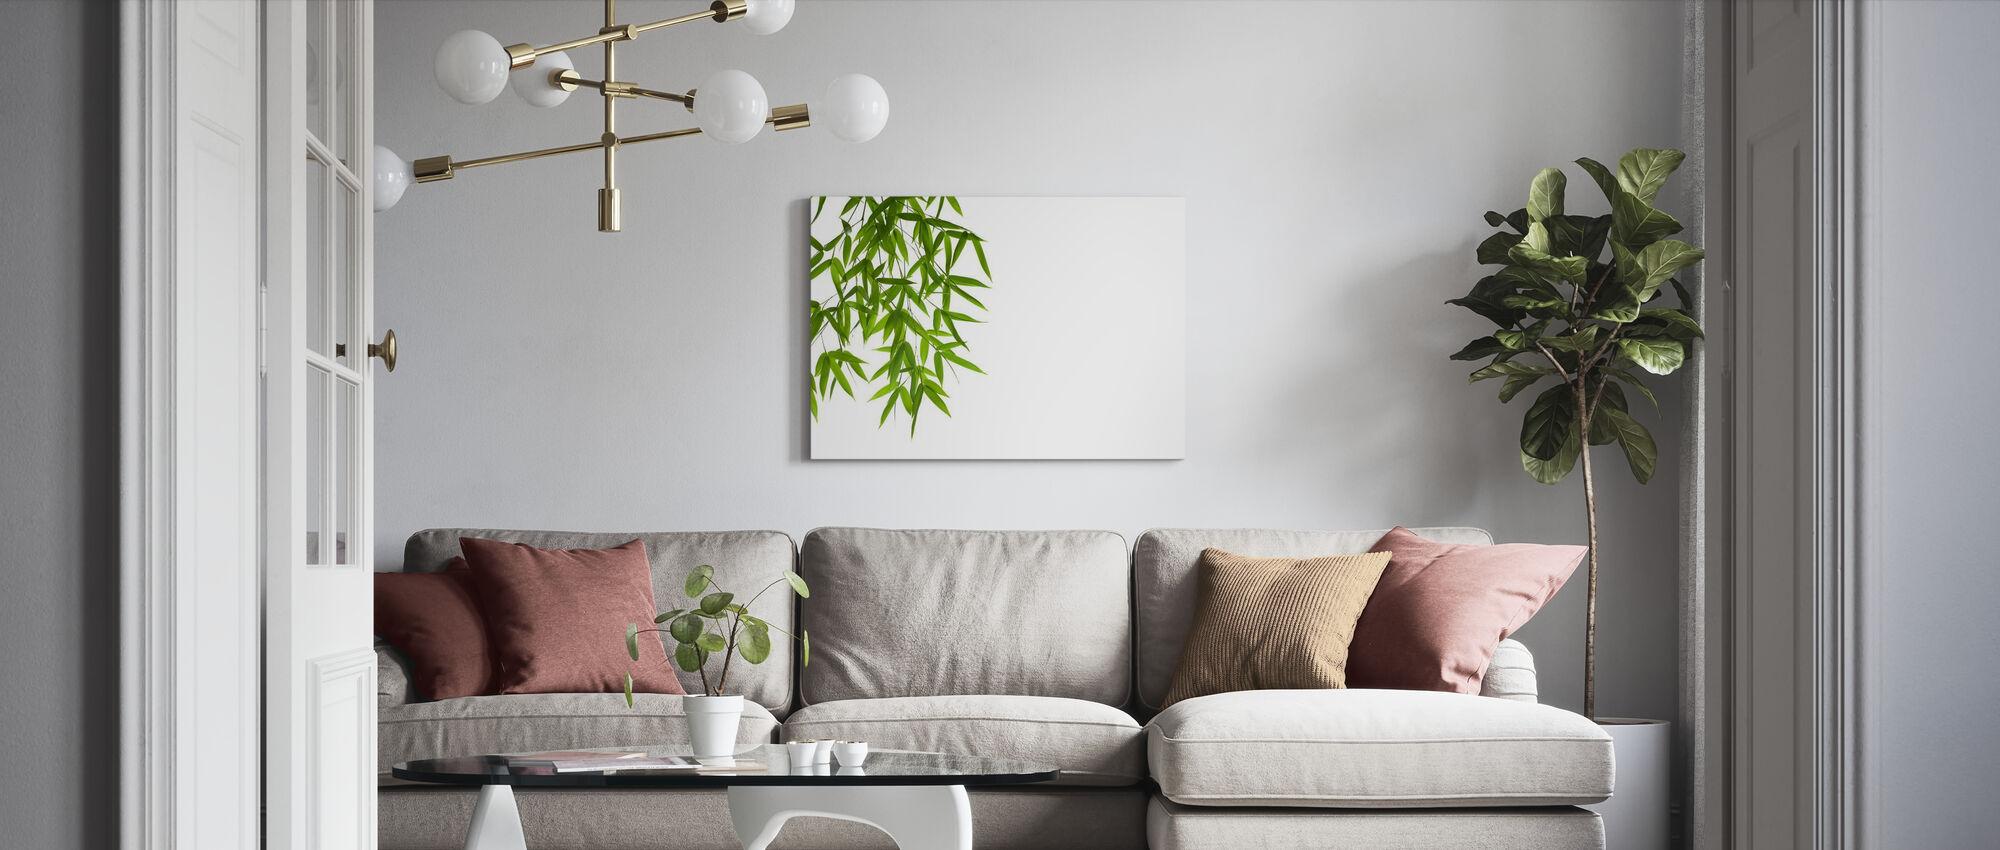 Hangende Bamboe - Canvas print - Woonkamer